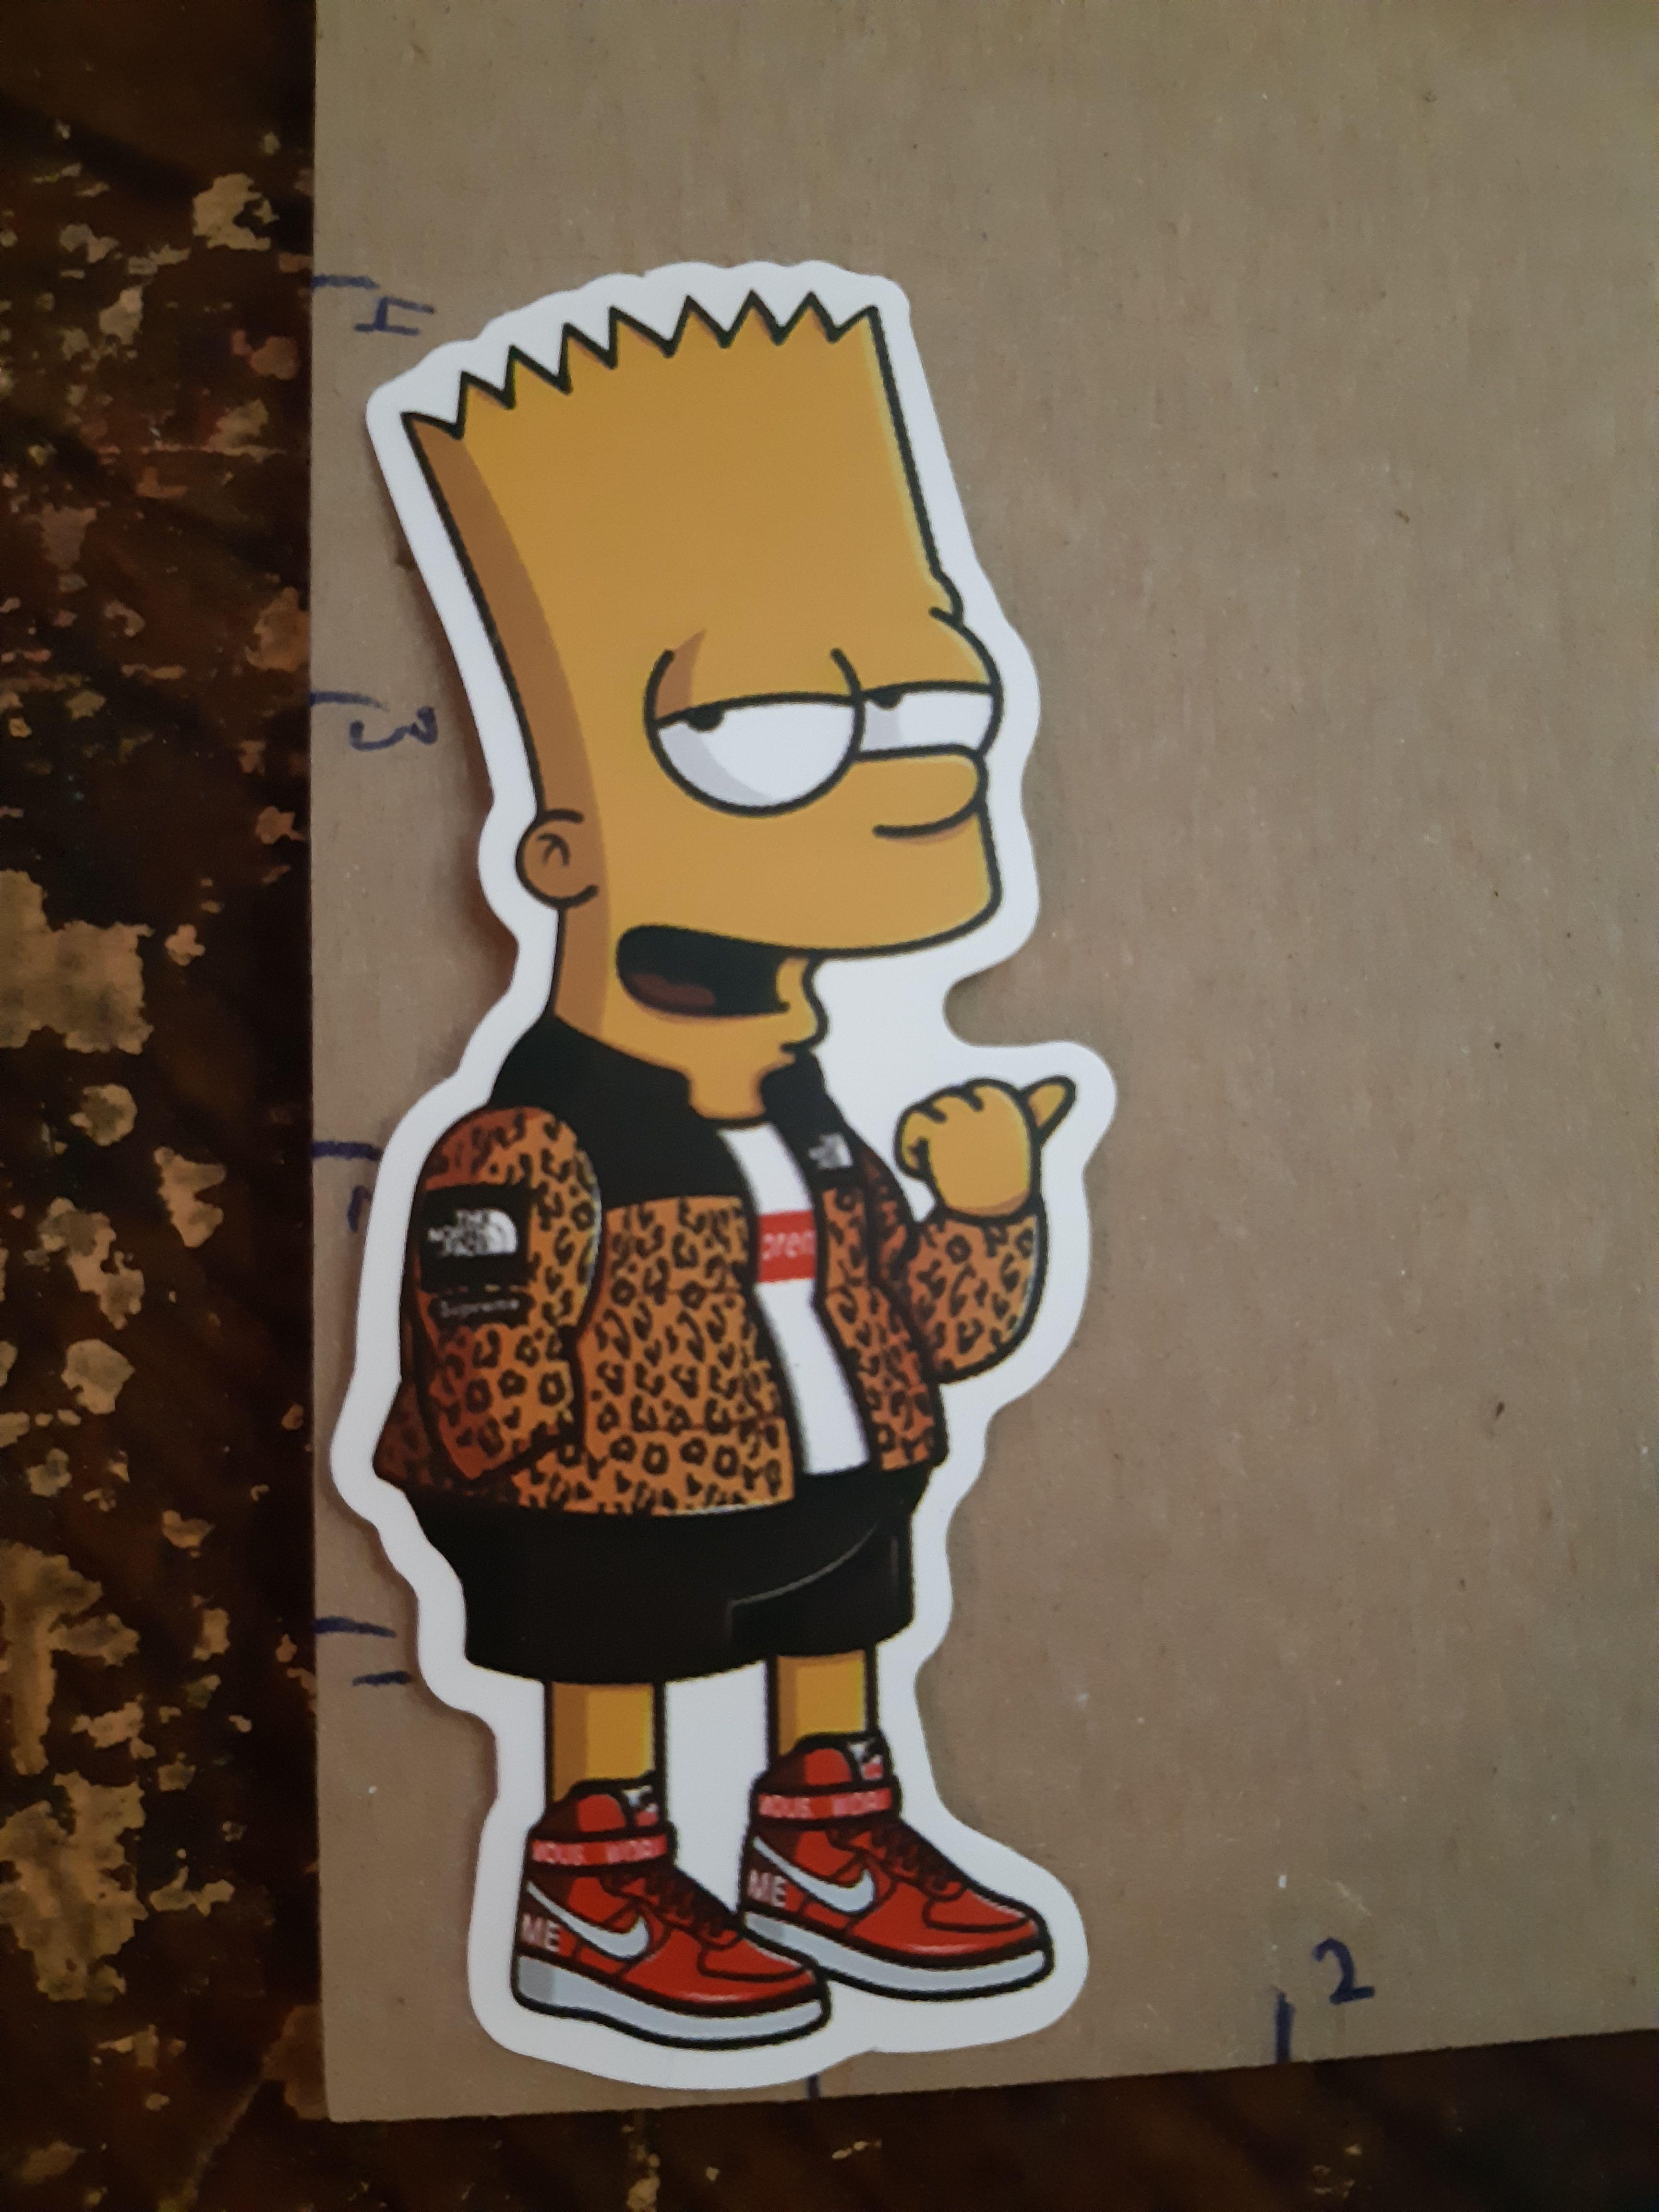 944d6b96cf29 Streetwear Bart Simpson  Skatewear  Skateboarding  NikeSB  Adidas  Vans   Supreme  Palace  Bape  Stussy  Obey  Thrasher  RIPNDIP  fuct   PalaceSkateboards   ...